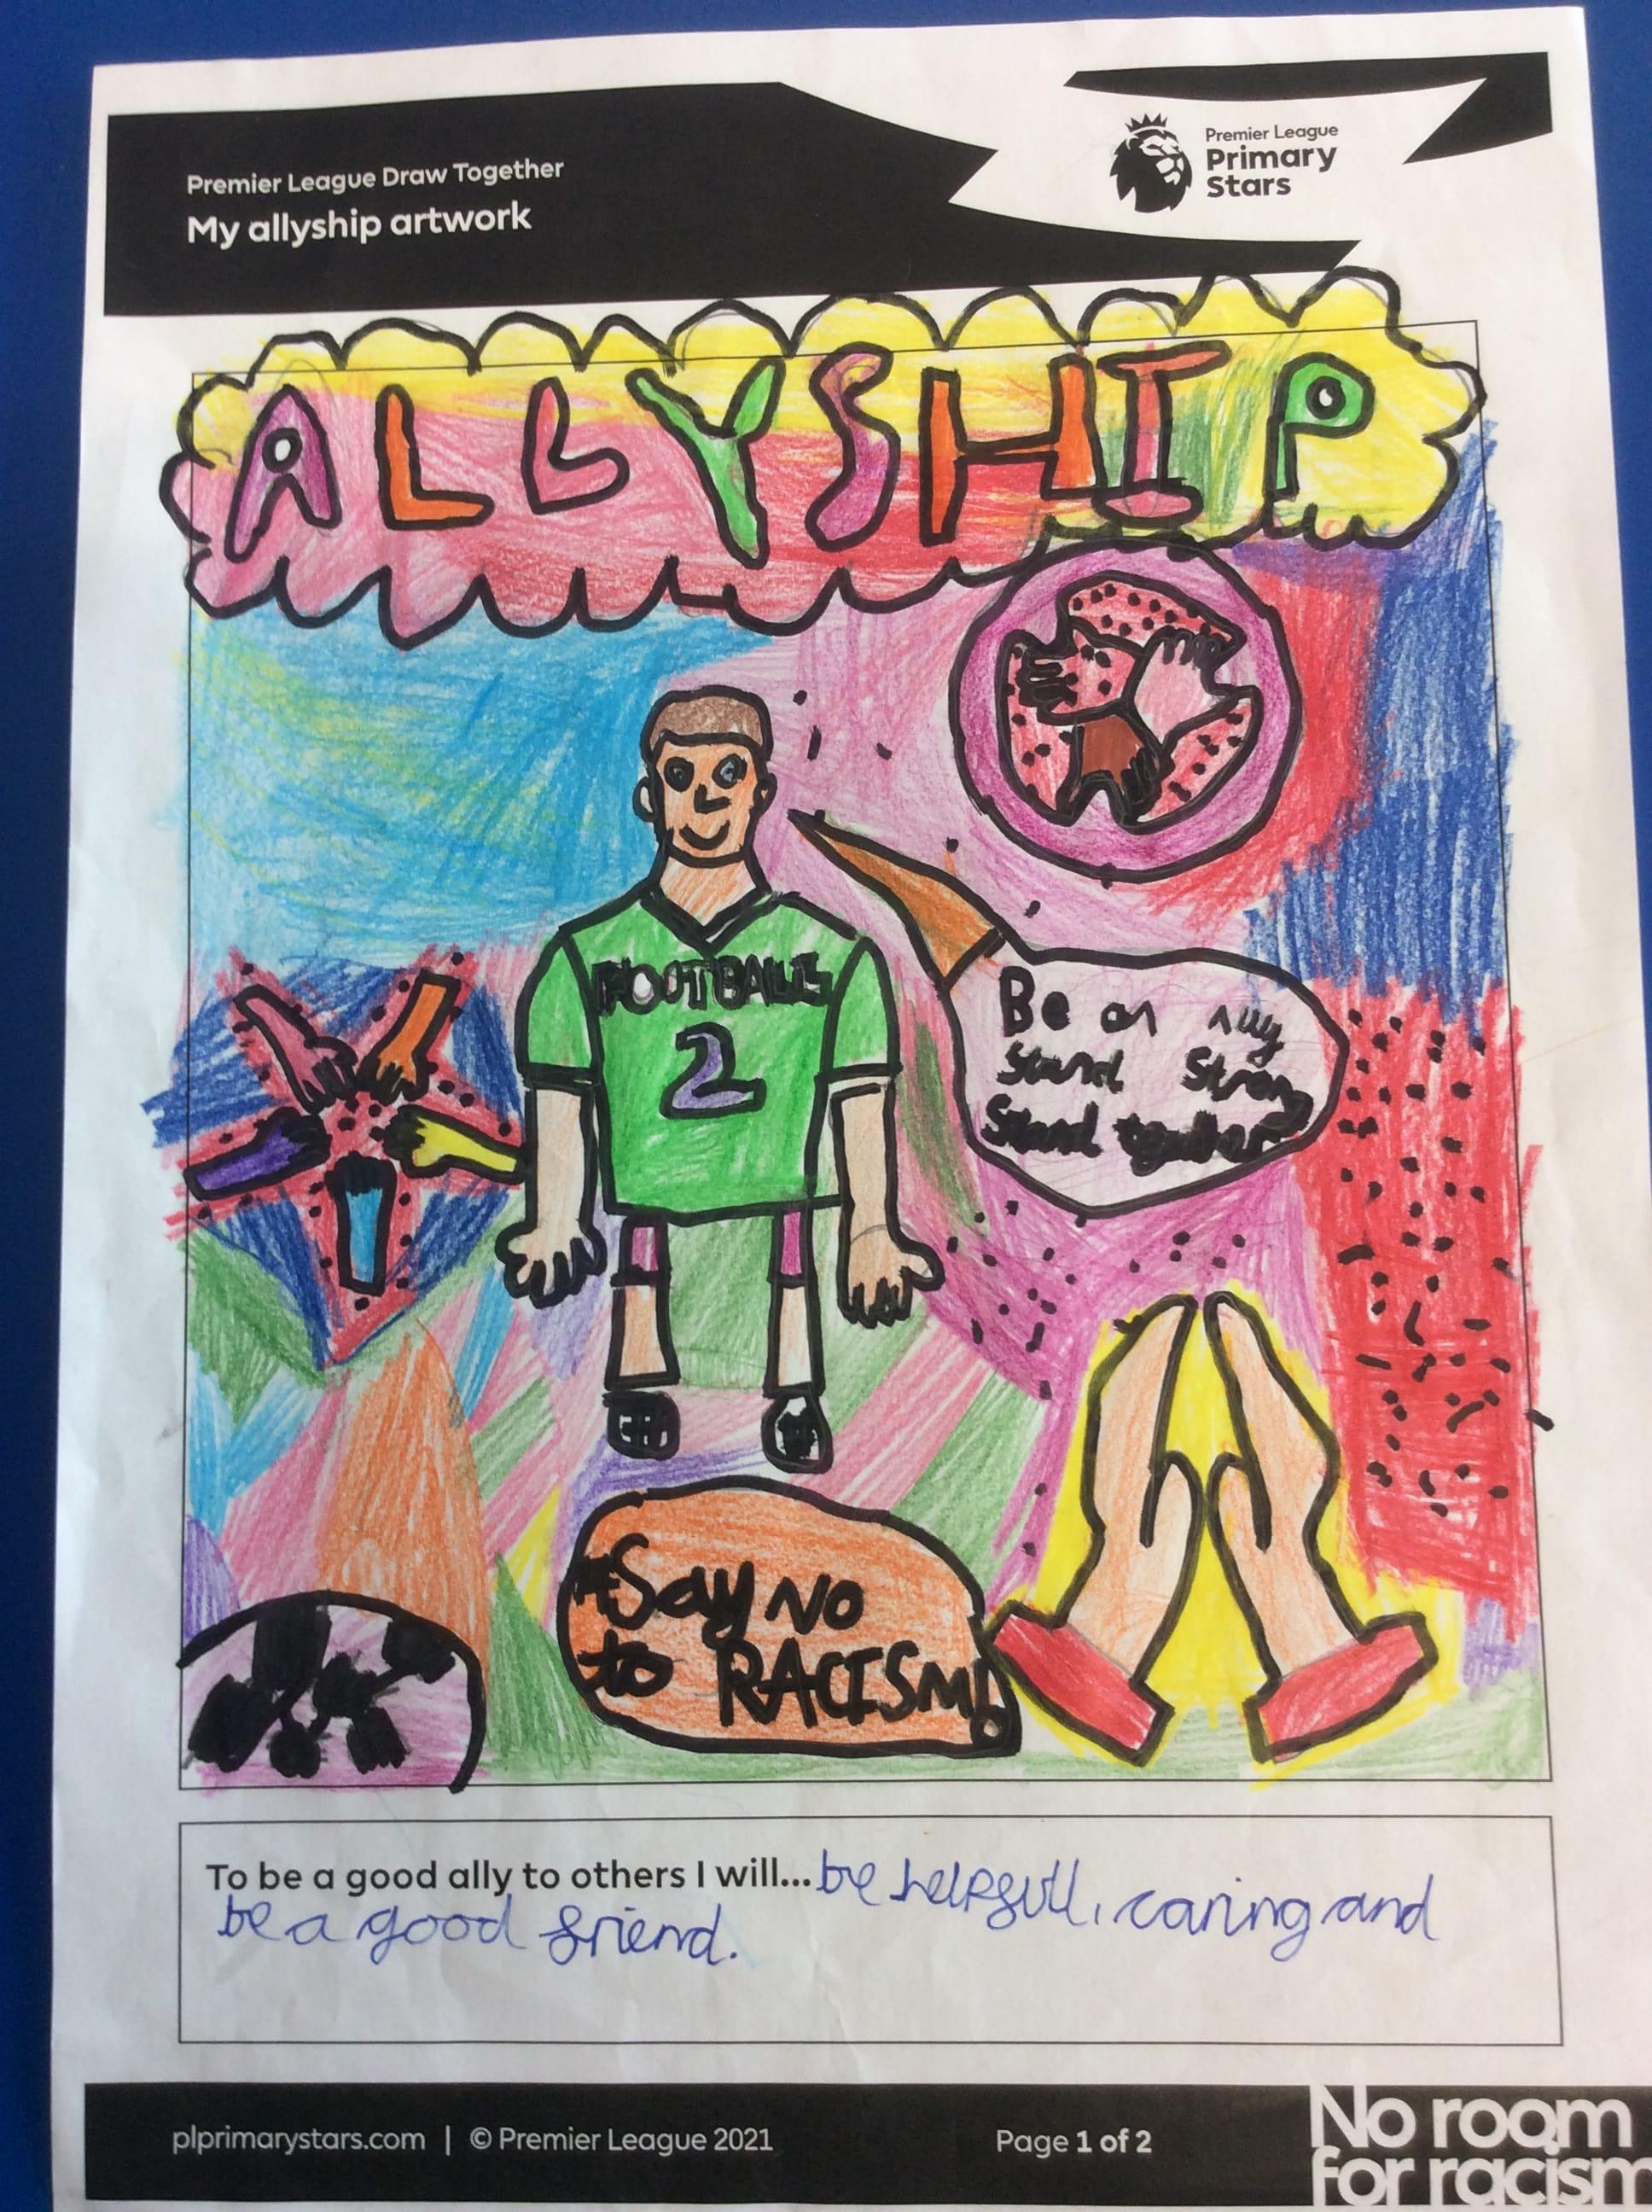 Hannah allyship artwork